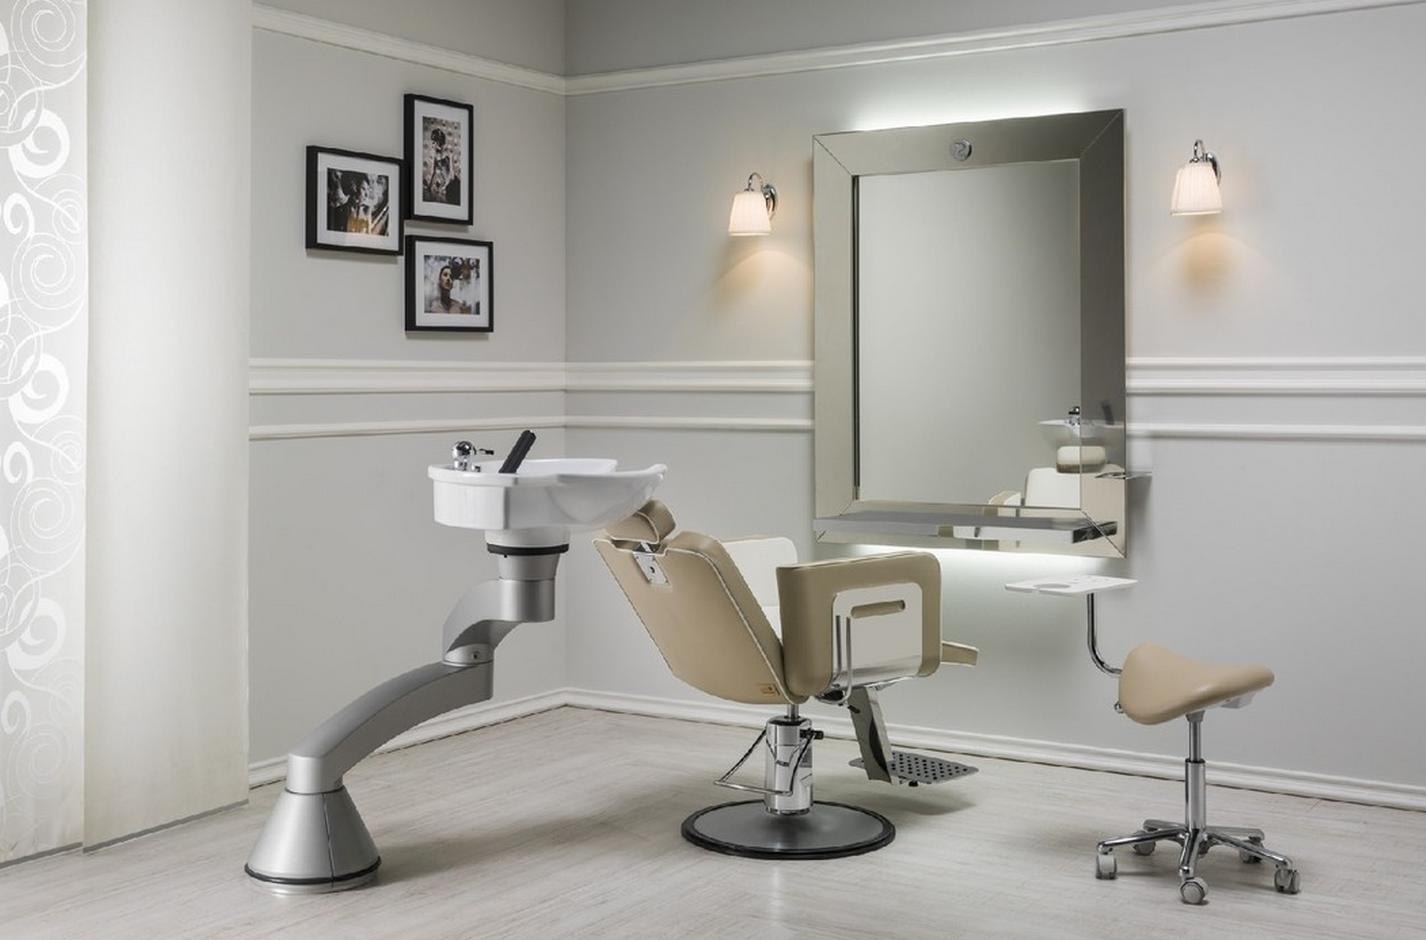 Naos design barbershop luxury elysium parrucchieri for Design arredamento parrucchieri